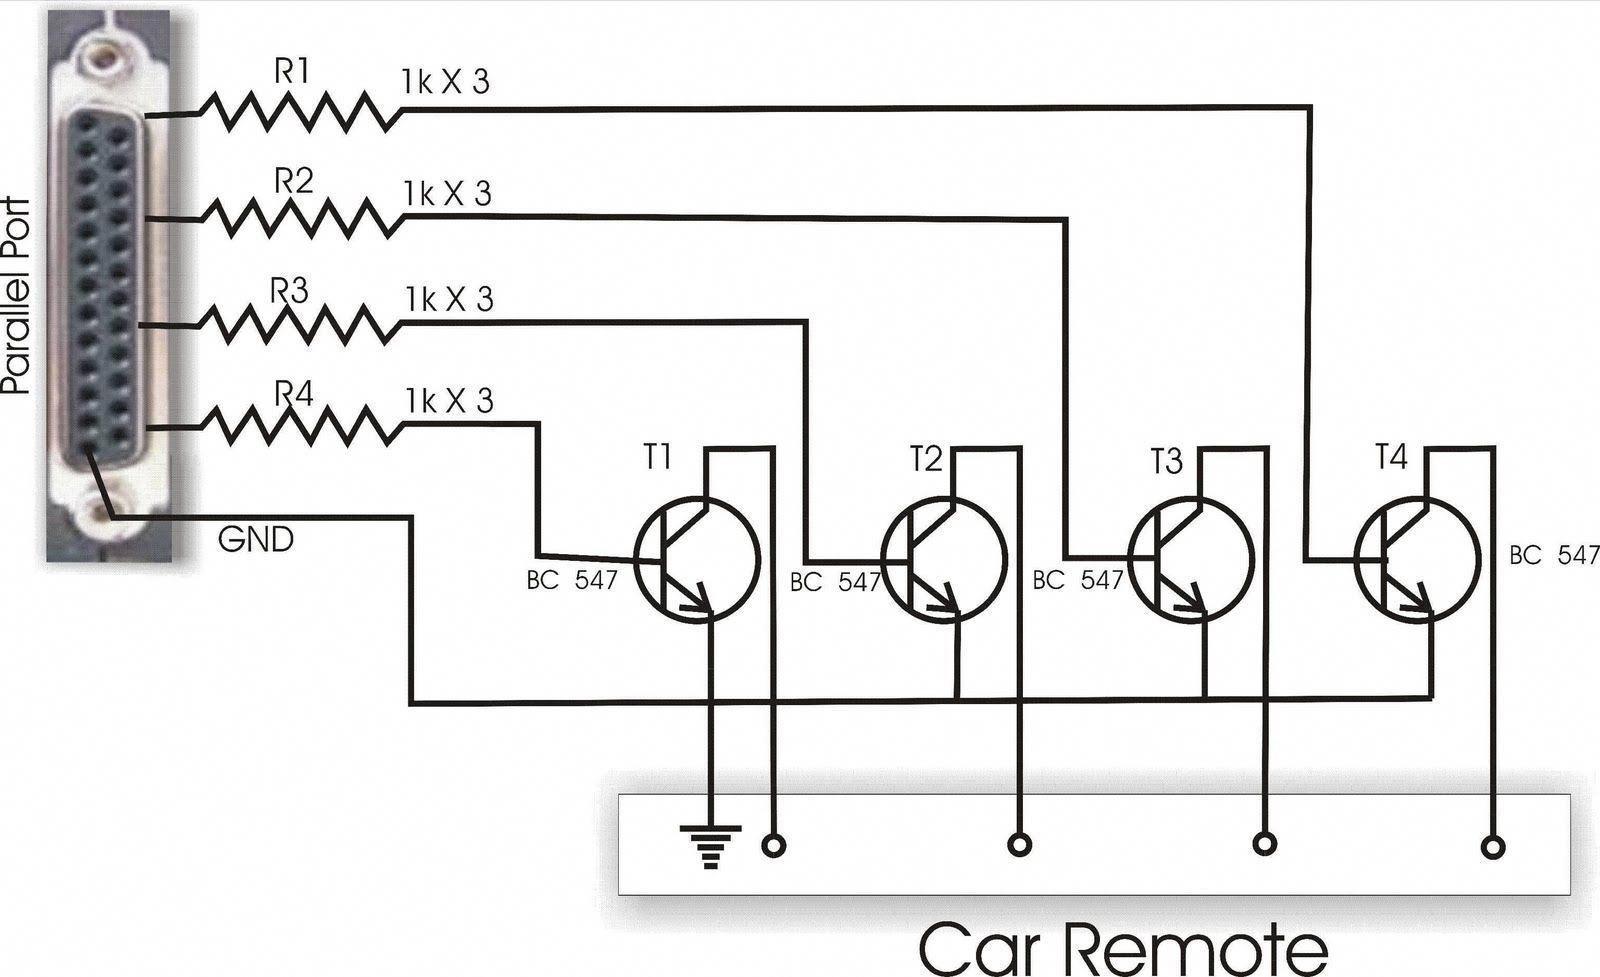 Computer Control Rc Car Circuit Diagram Radiocontrolboats Radio Control Diy Radio Control Radio Controlled Boats